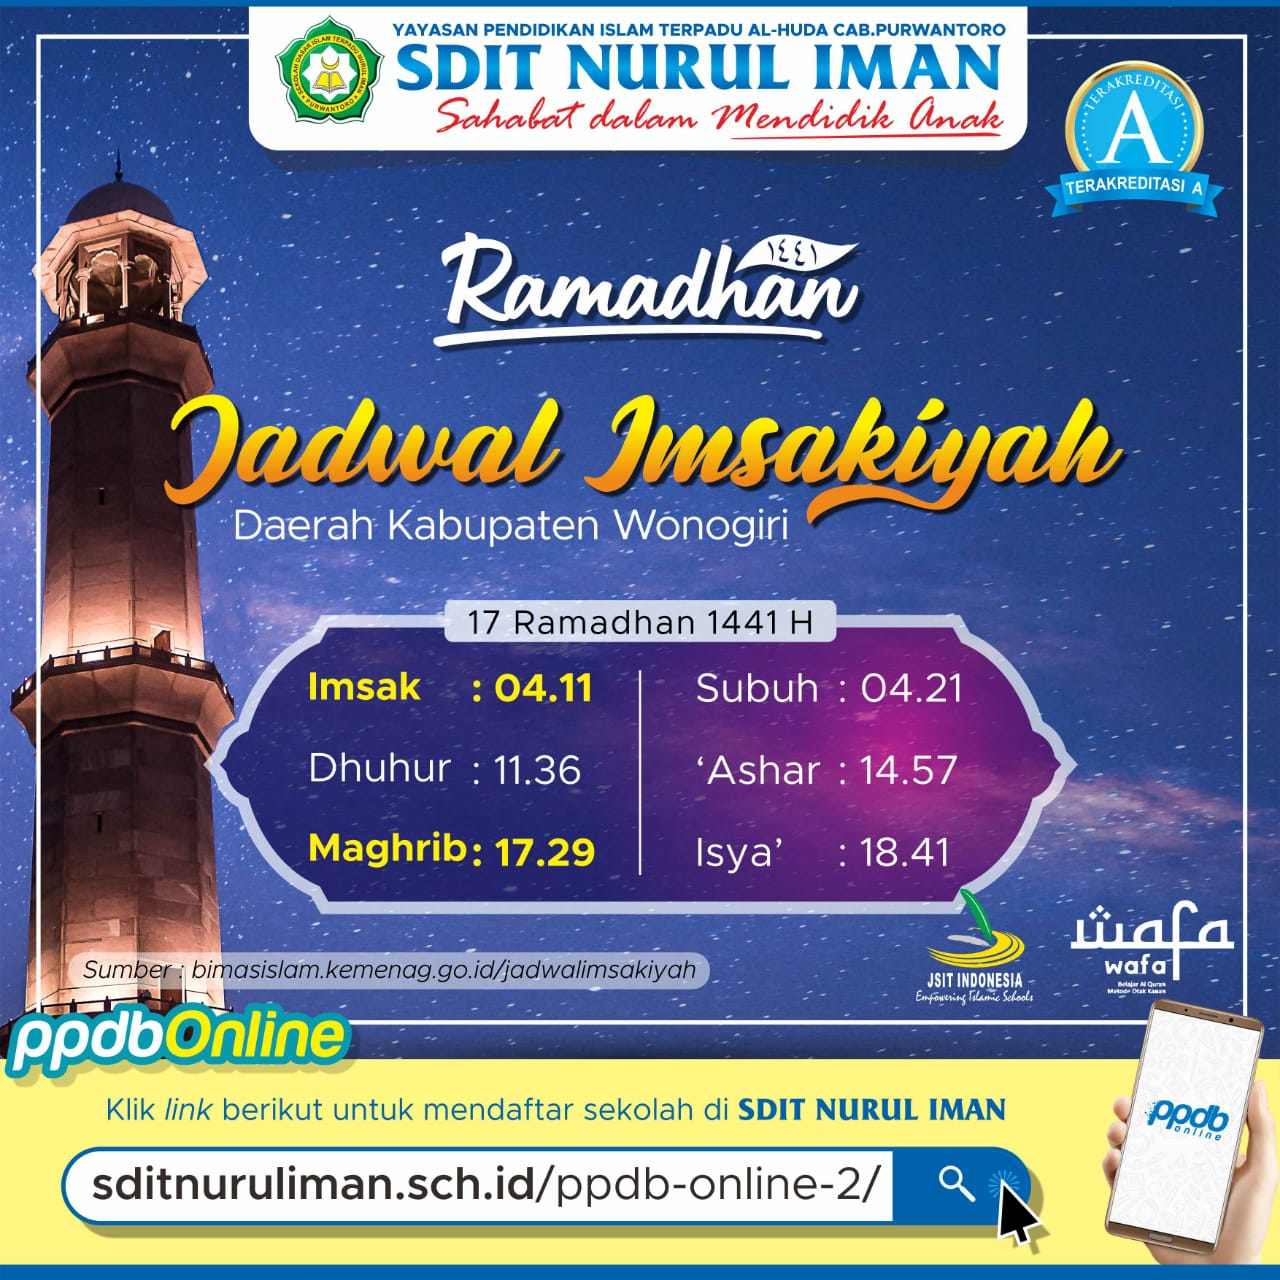 17 Ramadhan 1441 H